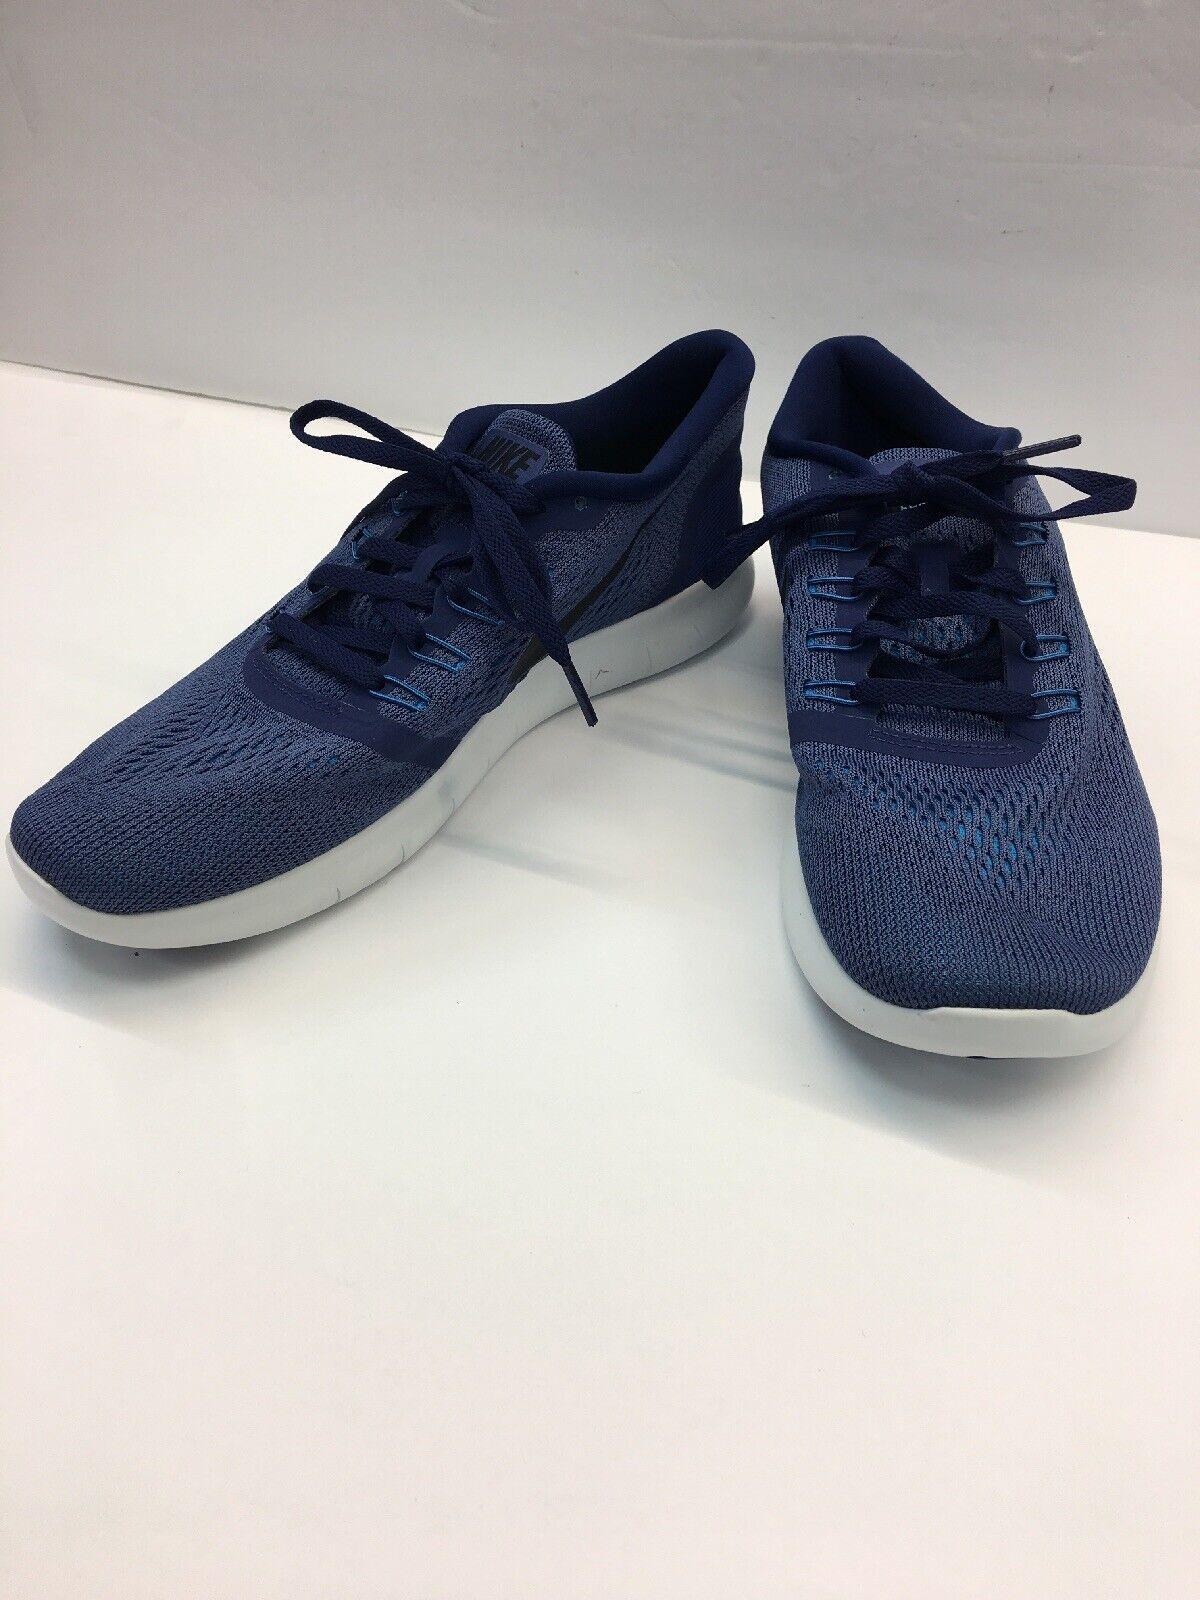 Nike Free RN 831508-500 Mens Running shoes Dark Purple & Black SIZE 8 NEW